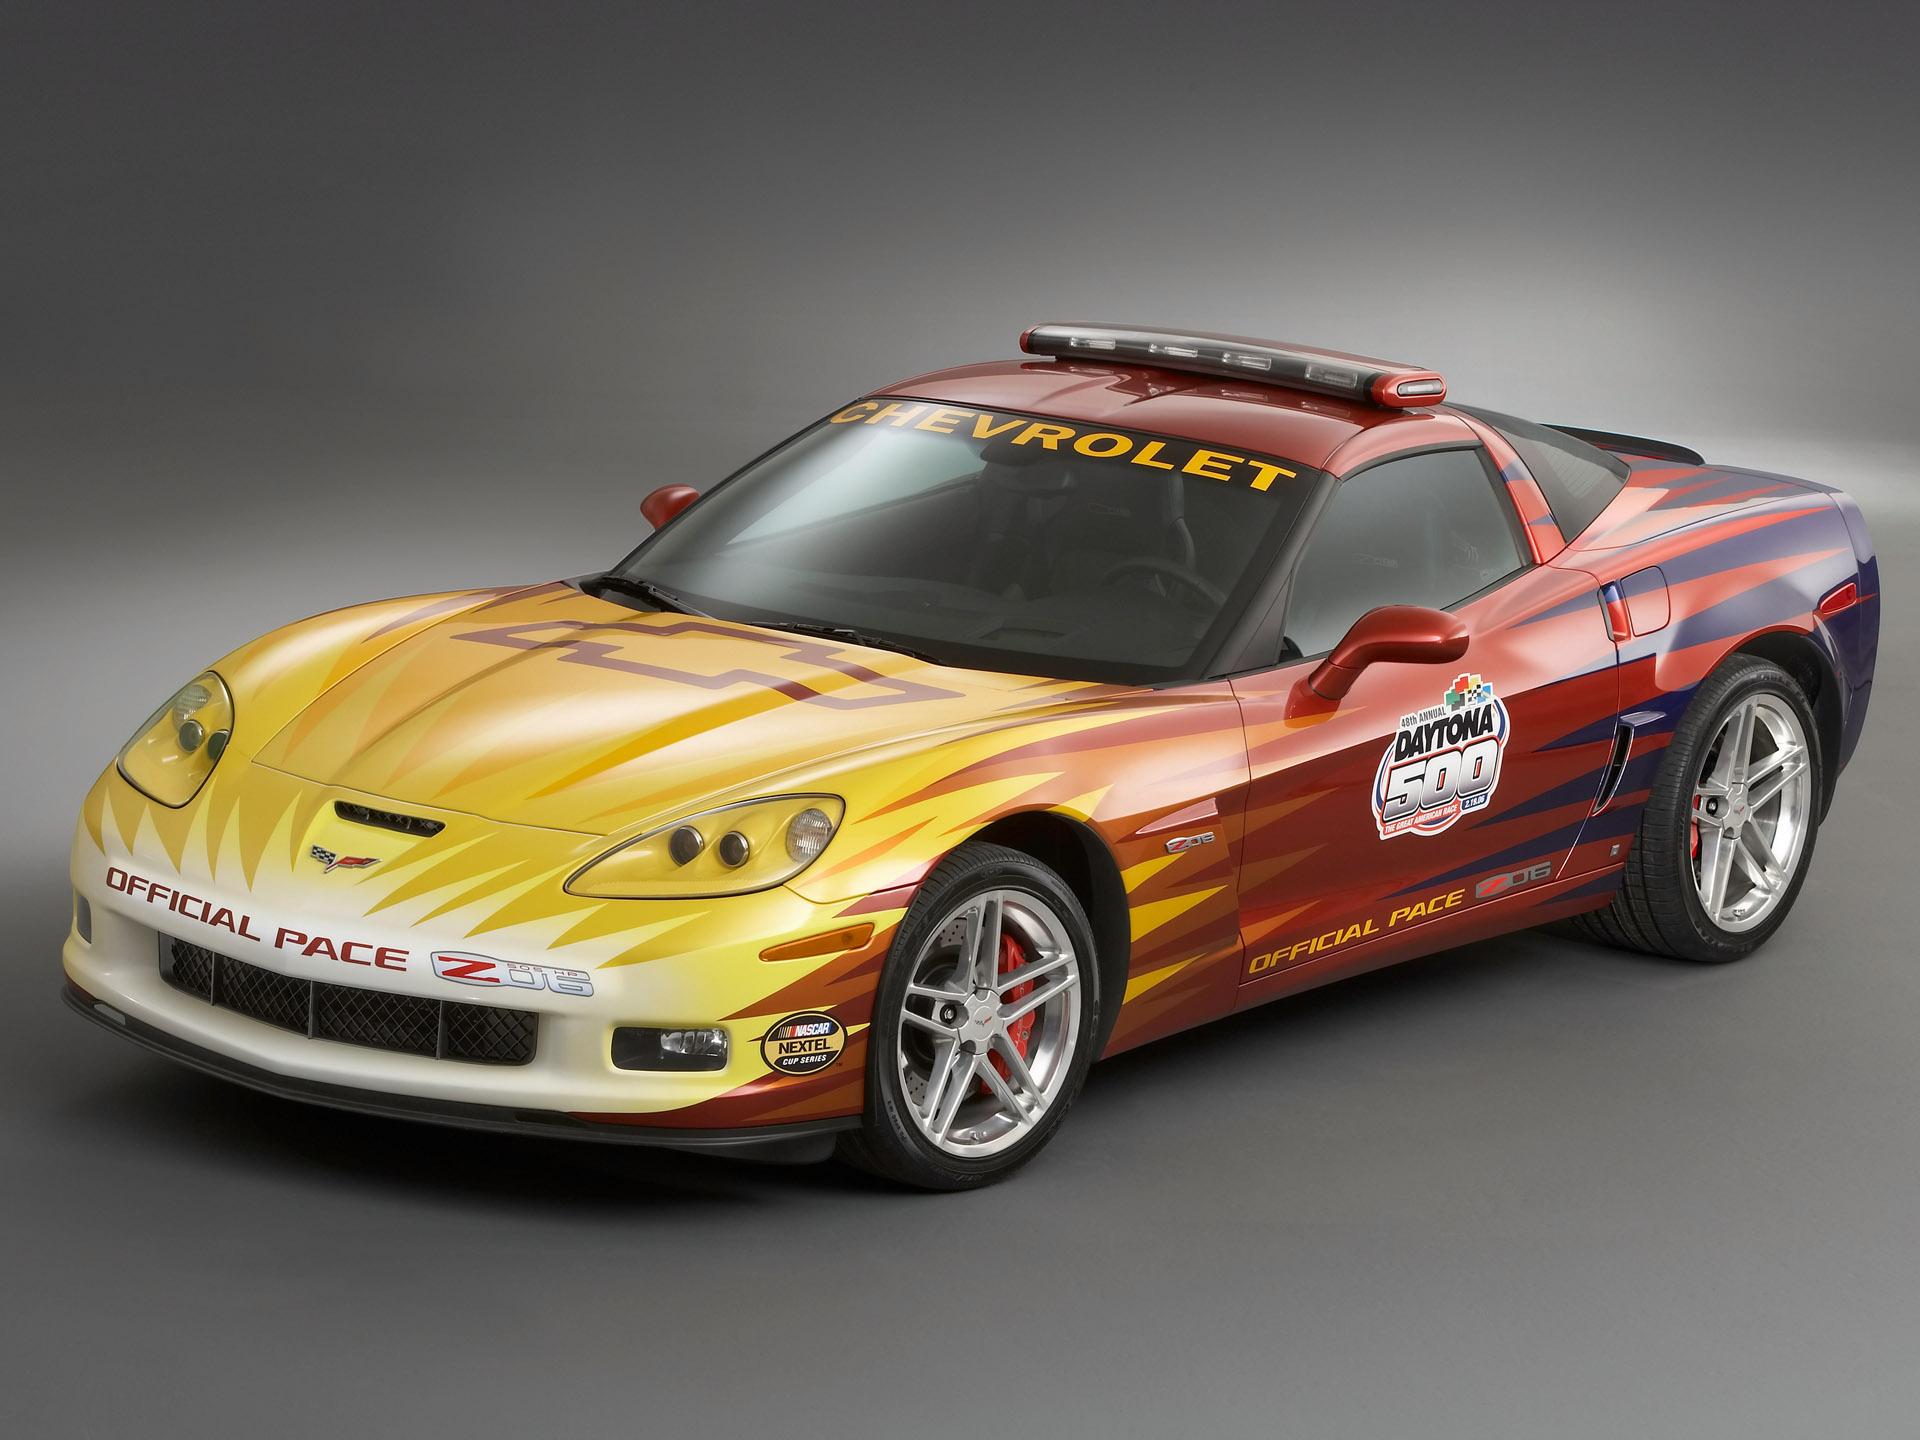 Desktop wallpaper downloads Chevrolet Corvette car   Huge 1920x1440